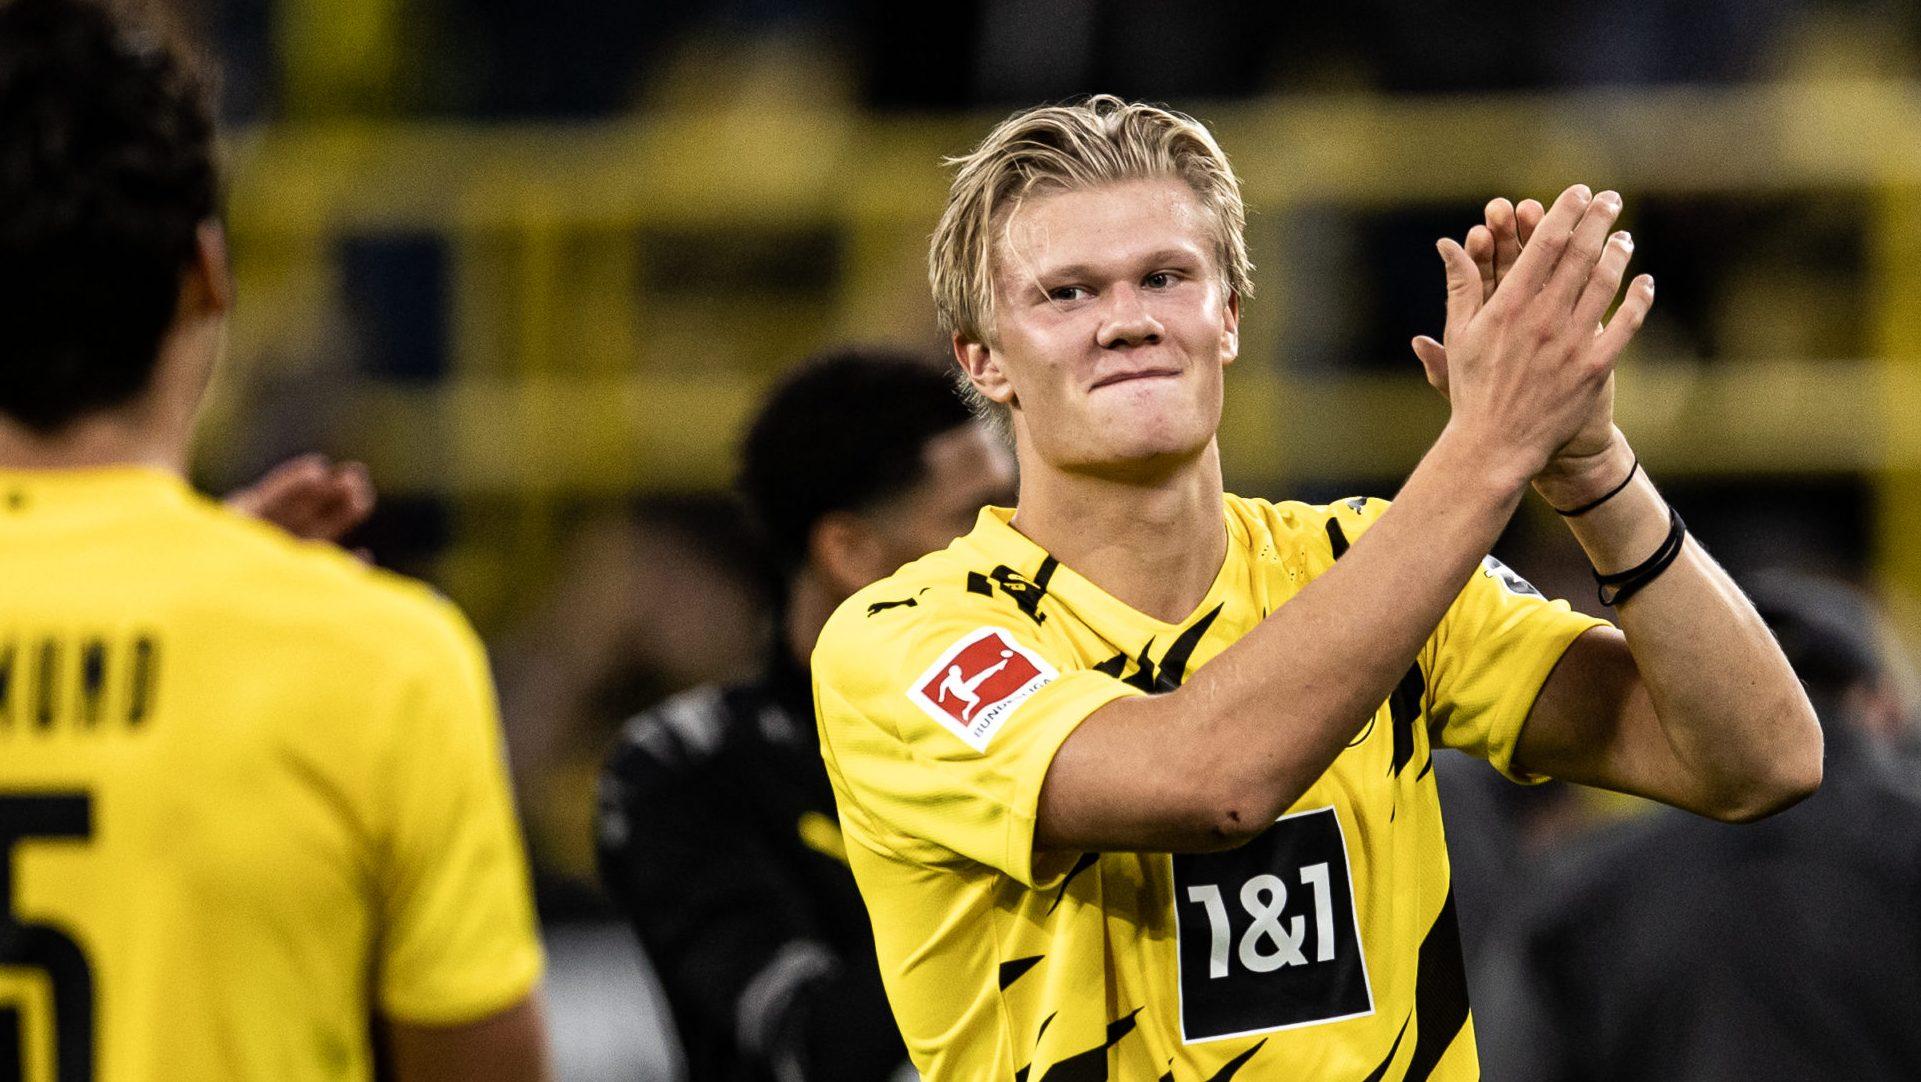 Bundesliga Borussia Dortmund S Erling Haaland I Could Have Scored 50 Goals Last Season I Need To Be More Clinical